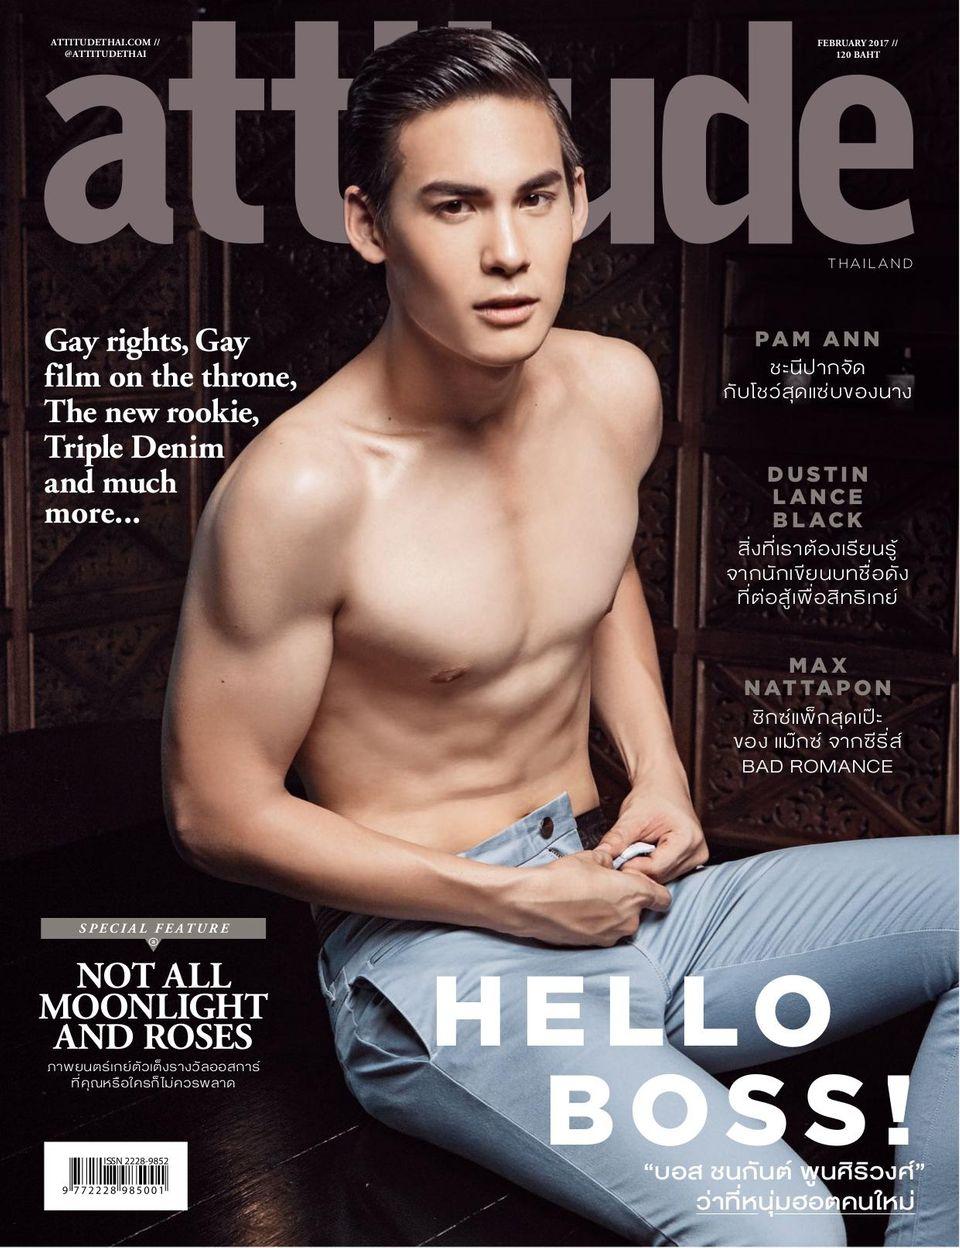 Attitude Thailand-February 2017 Magazine - Get your